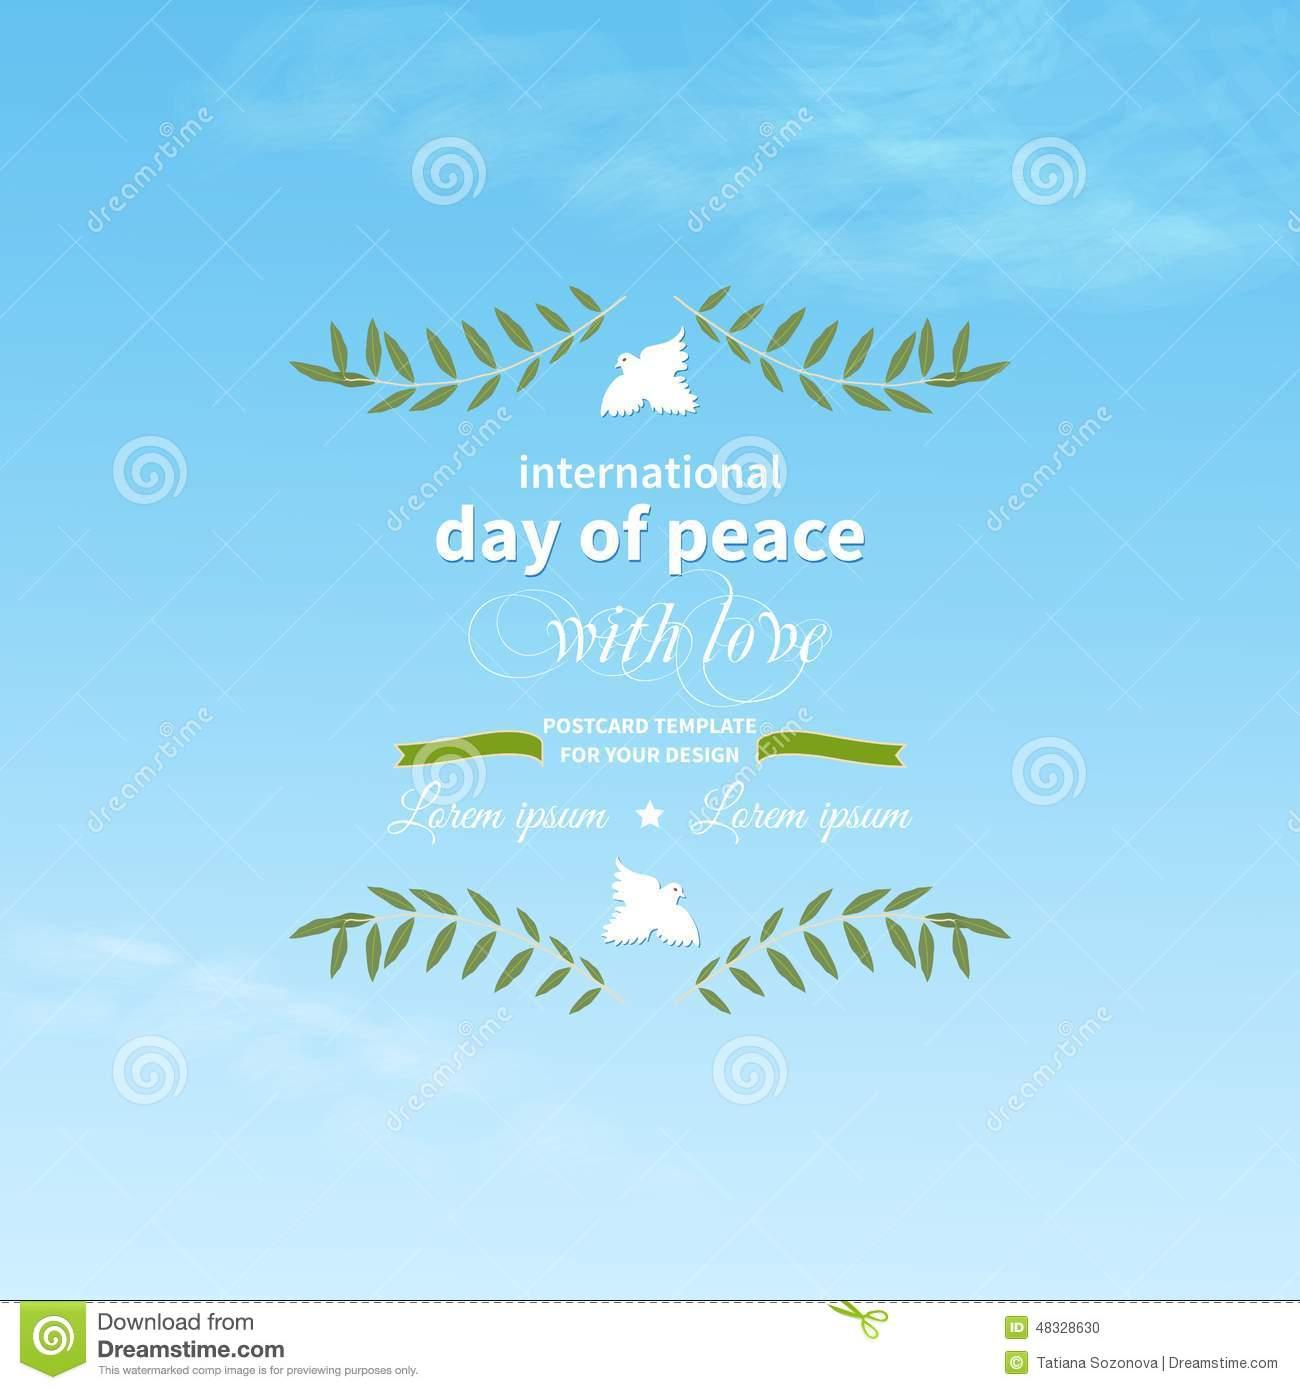 International Day of Peace Wallpaper 16   1300 X 1390 stmednet 1300x1390